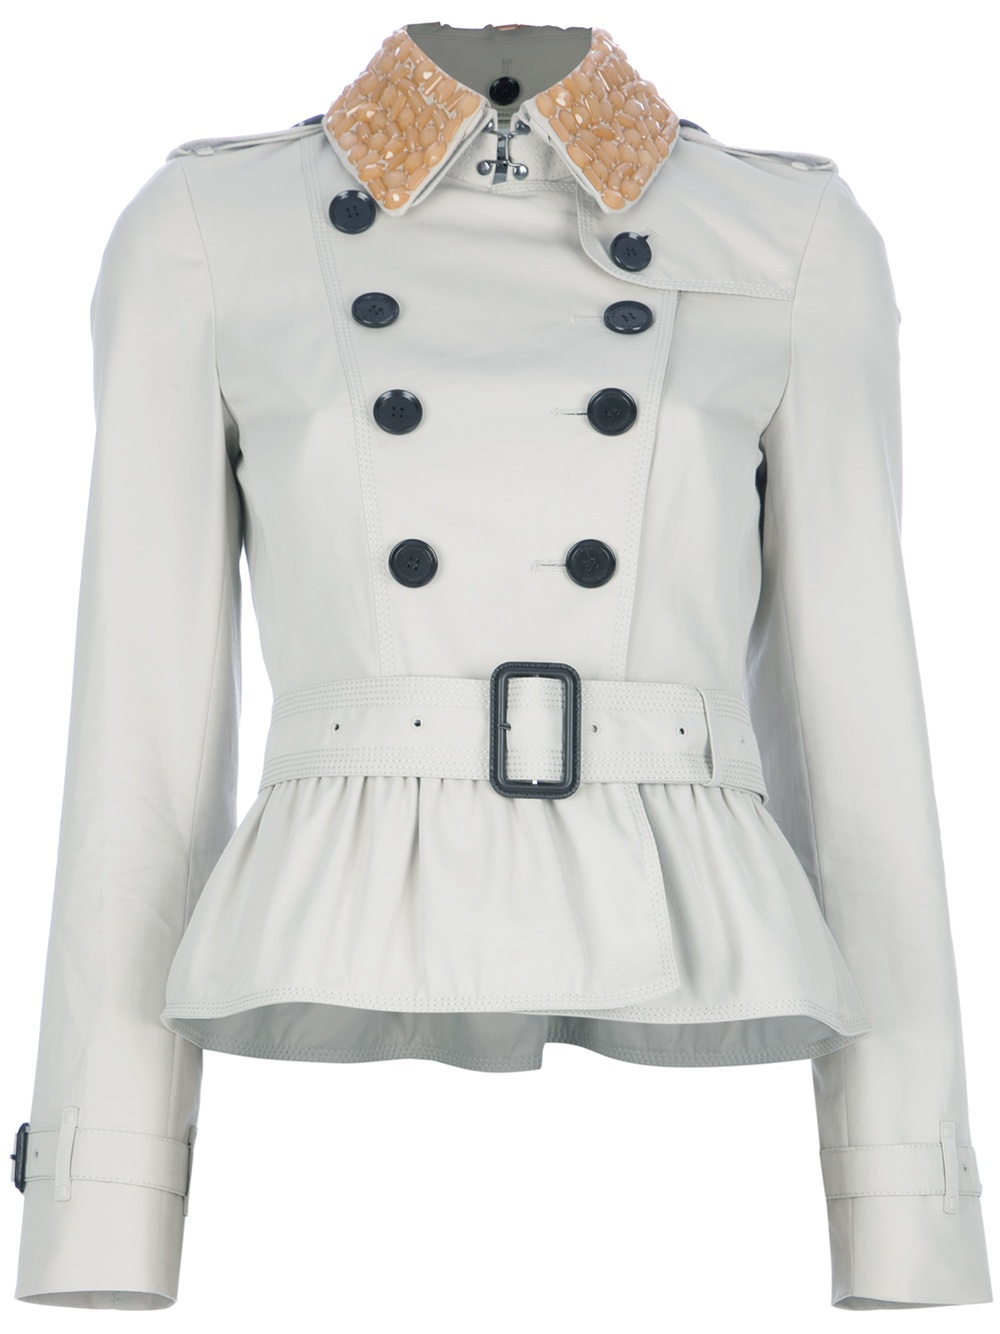 Burberry Short Peplum Trench Jacket in White | Lyst